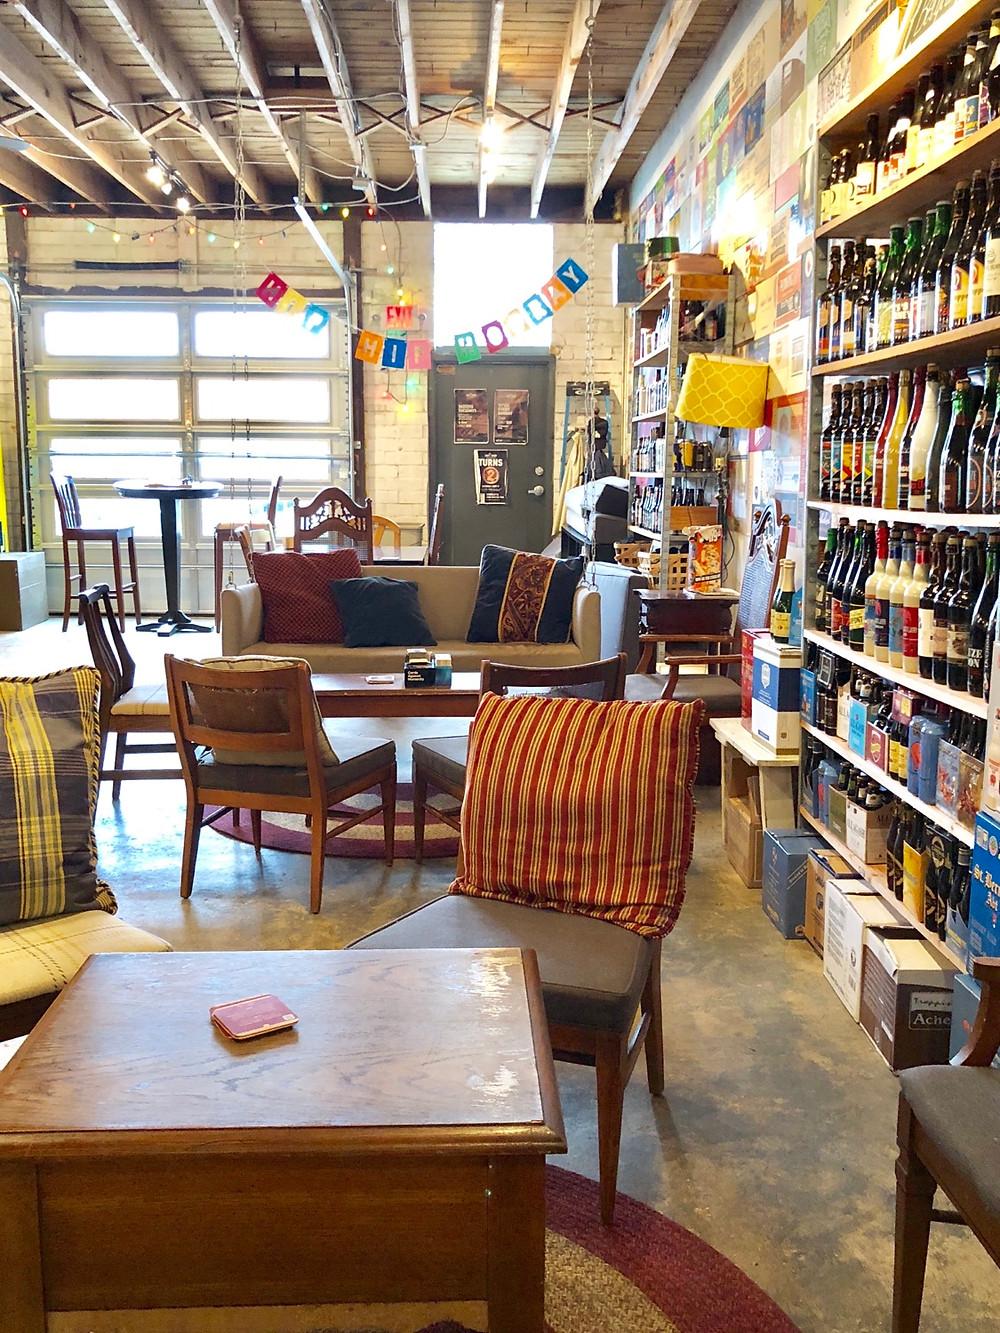 Charlotte Bottle Shops: the hop shop